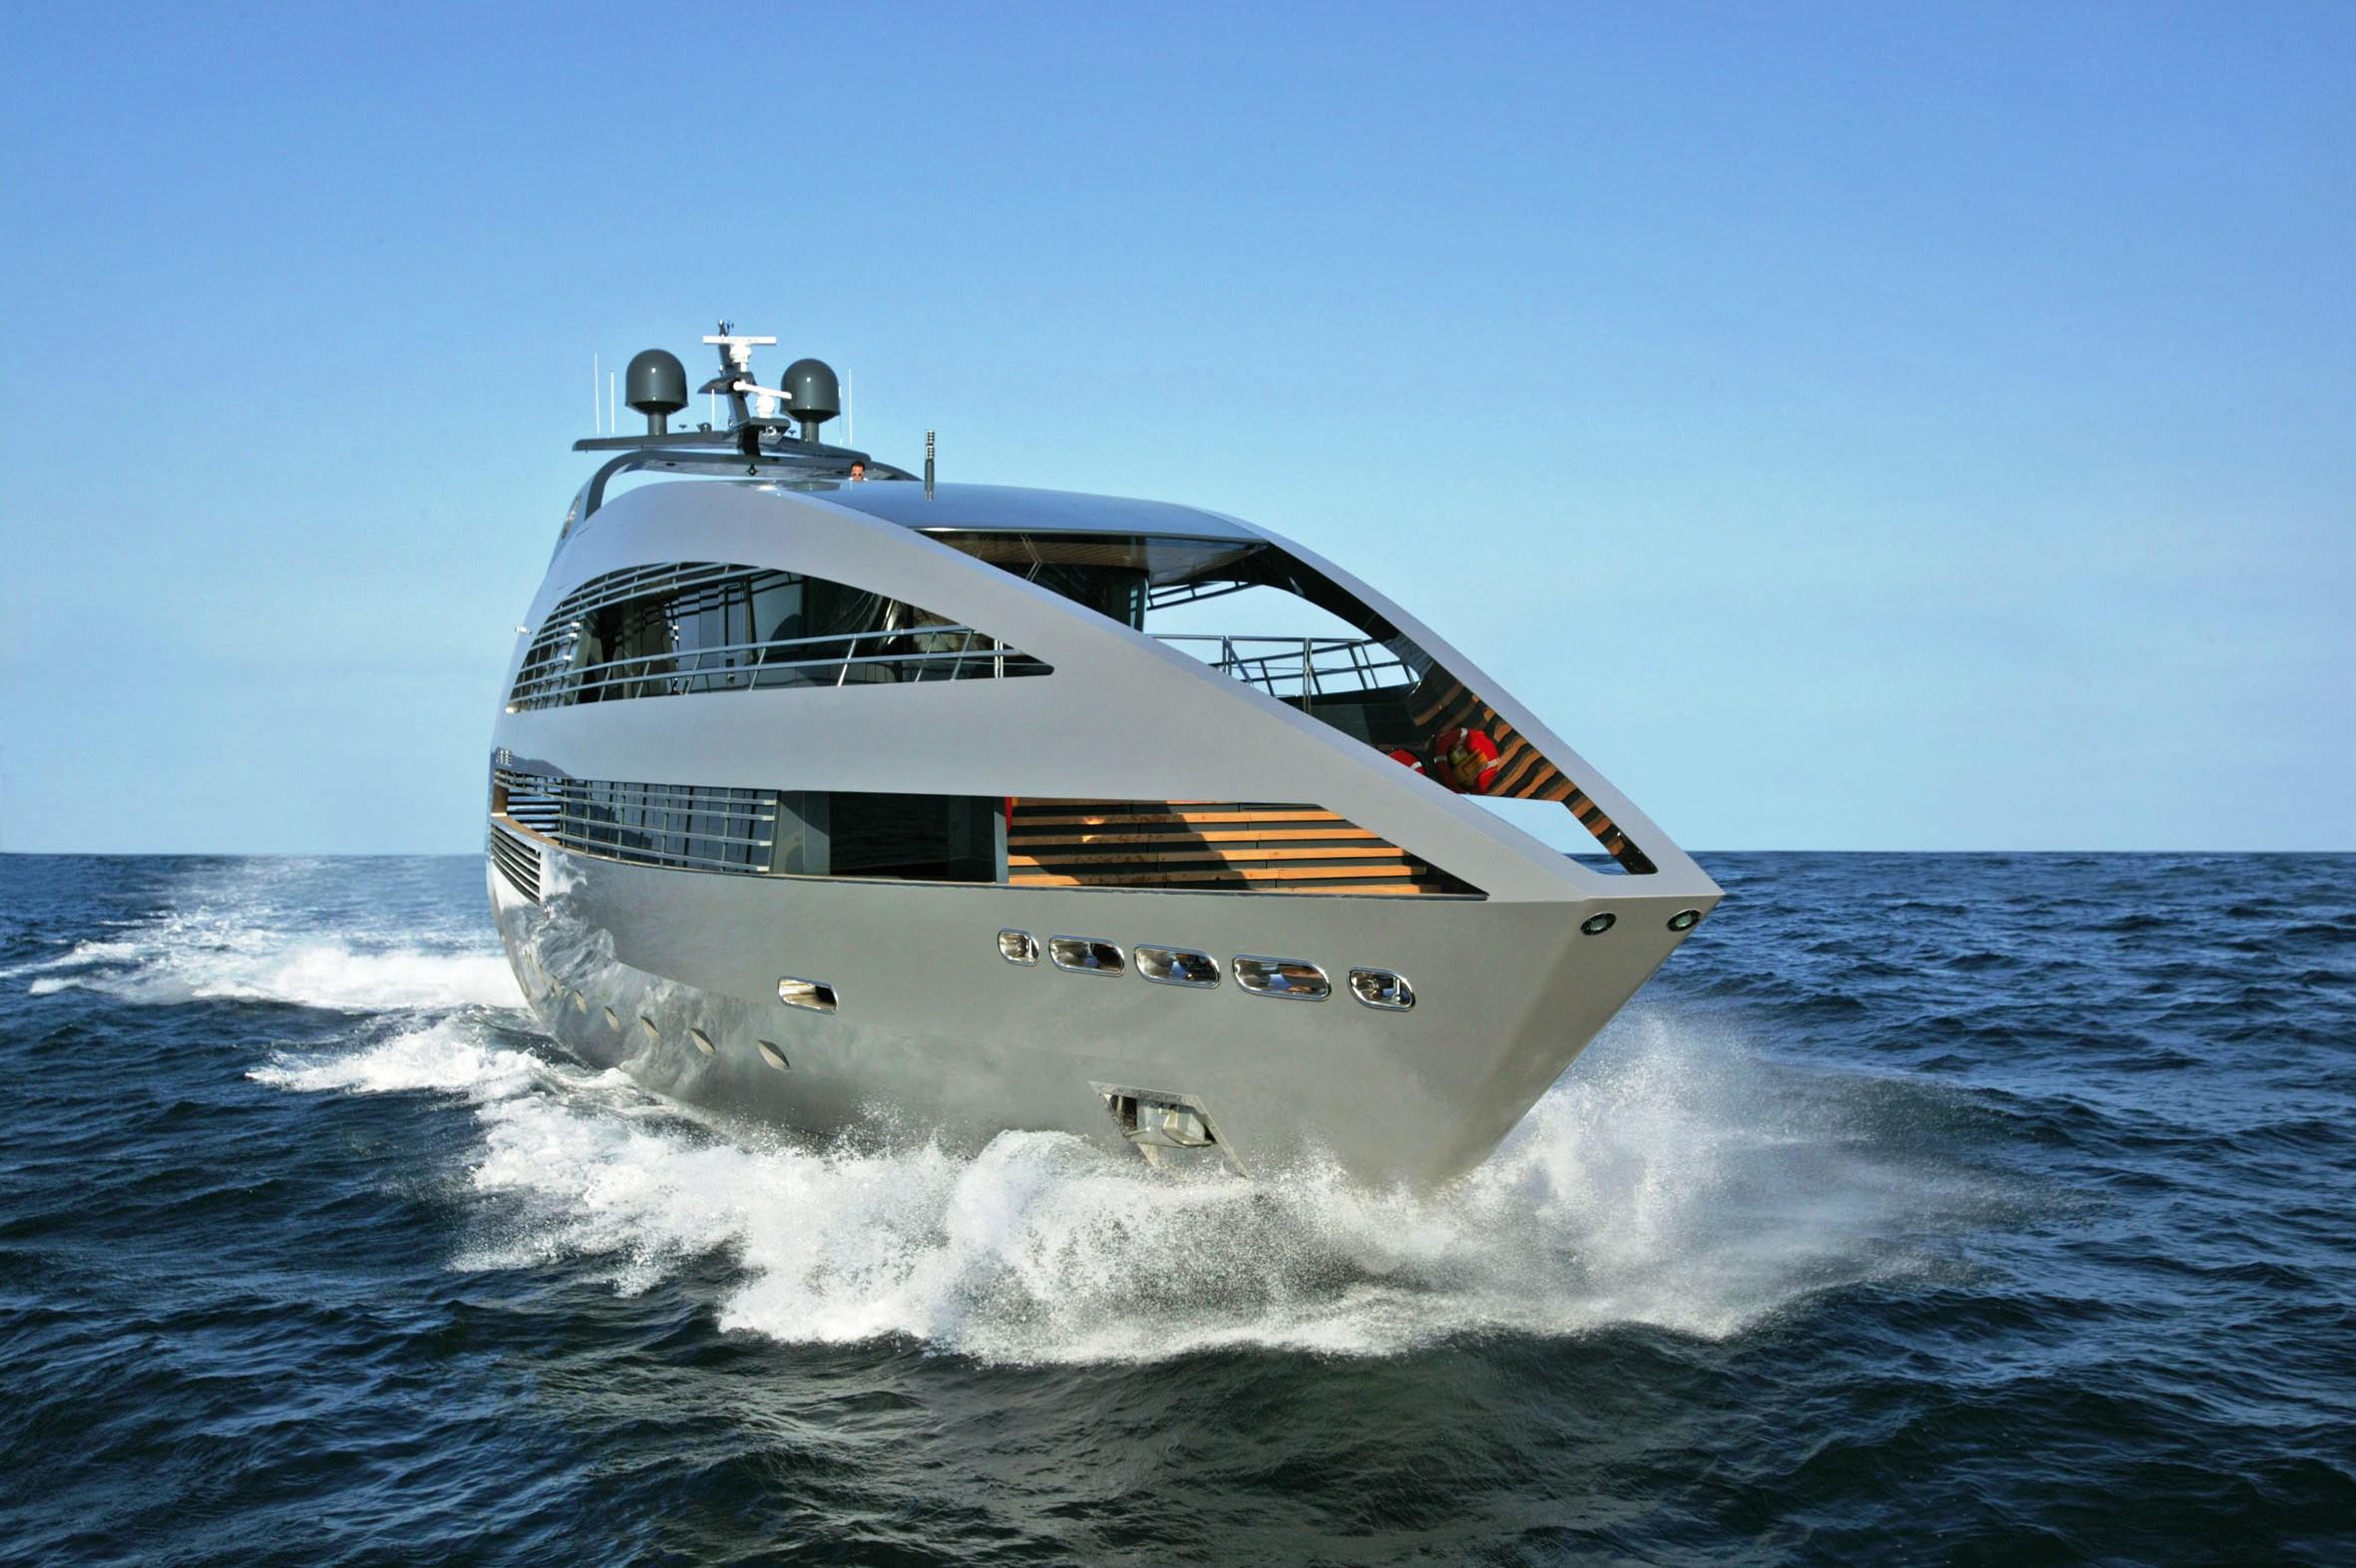 Ocean pearl yacht charter superyacht news for Bateau de luxe interieur